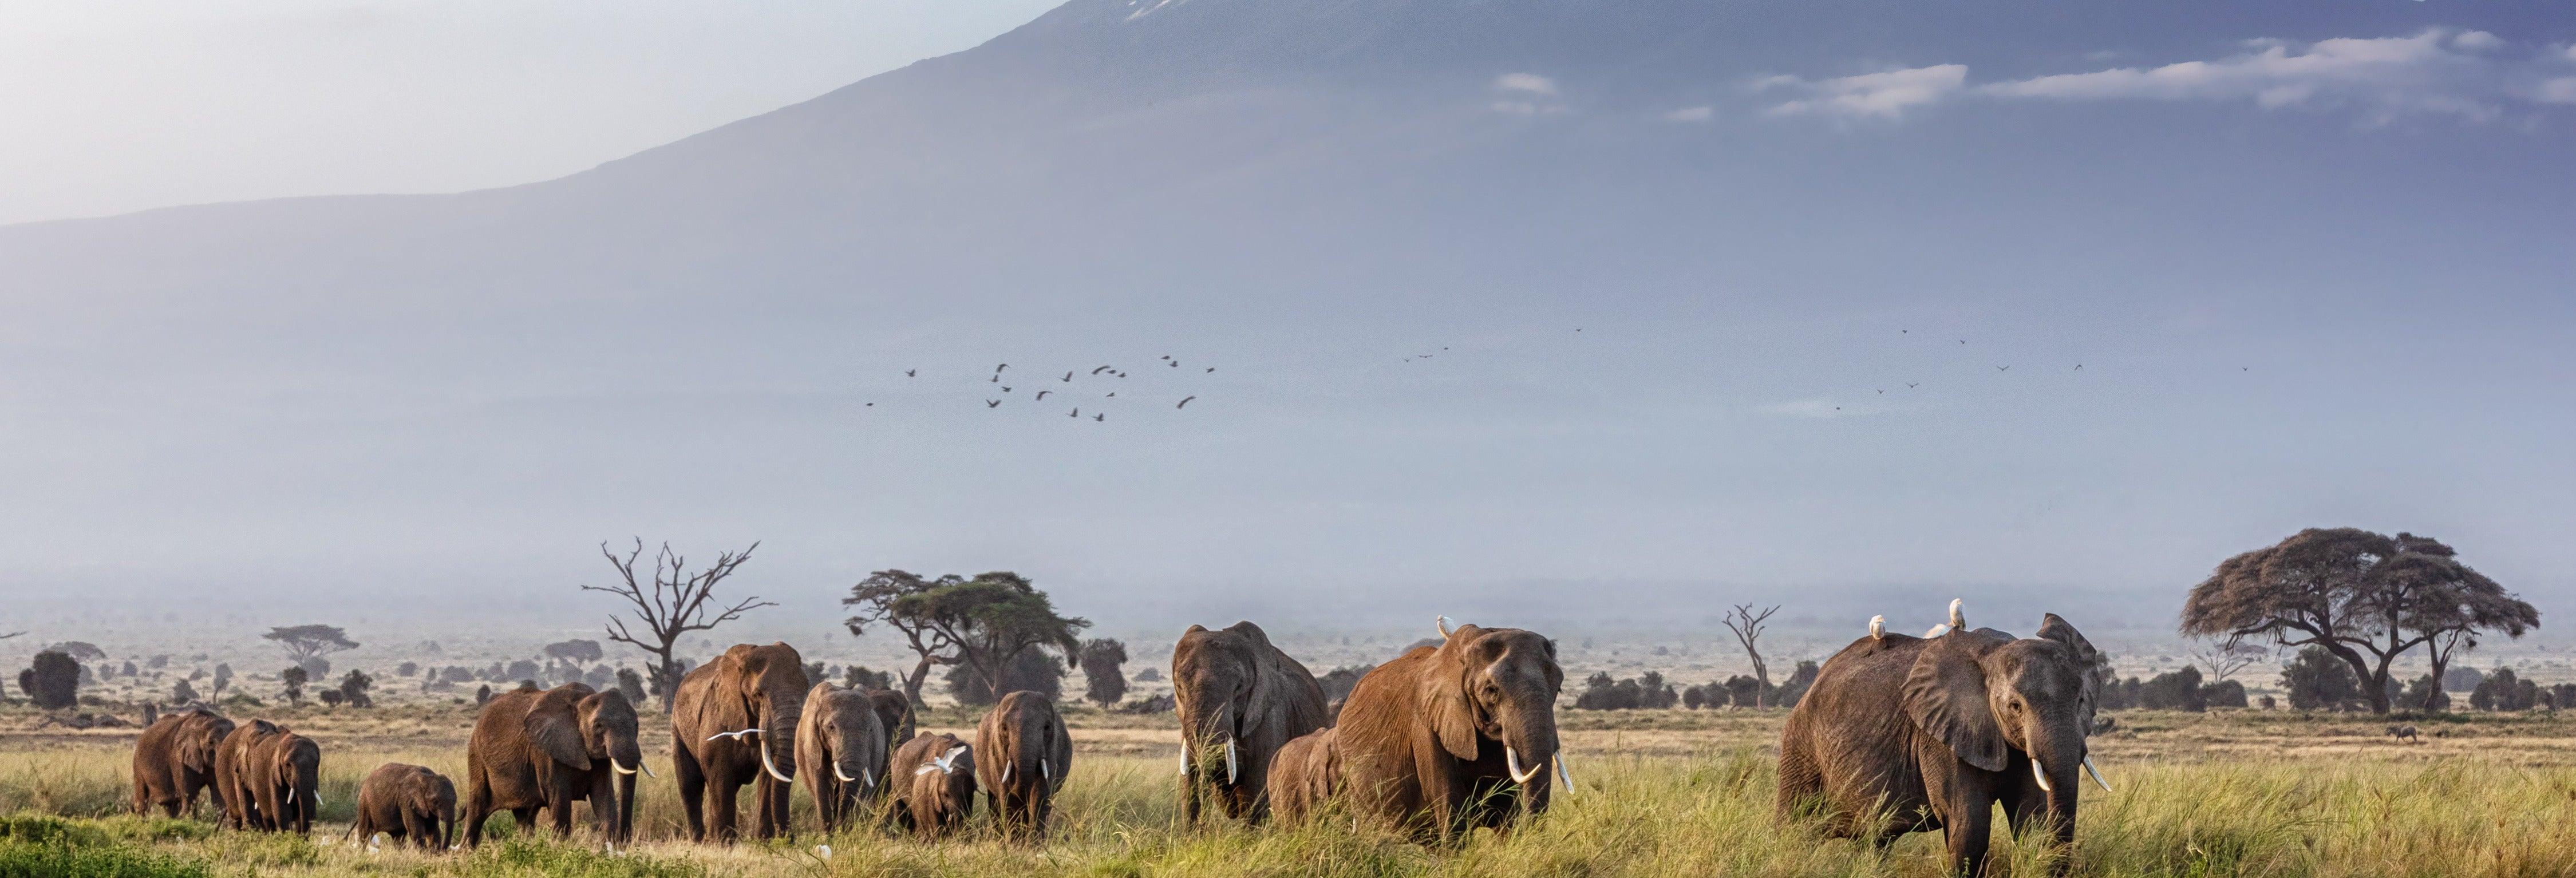 Amboseli National Park Safari: 3 Days